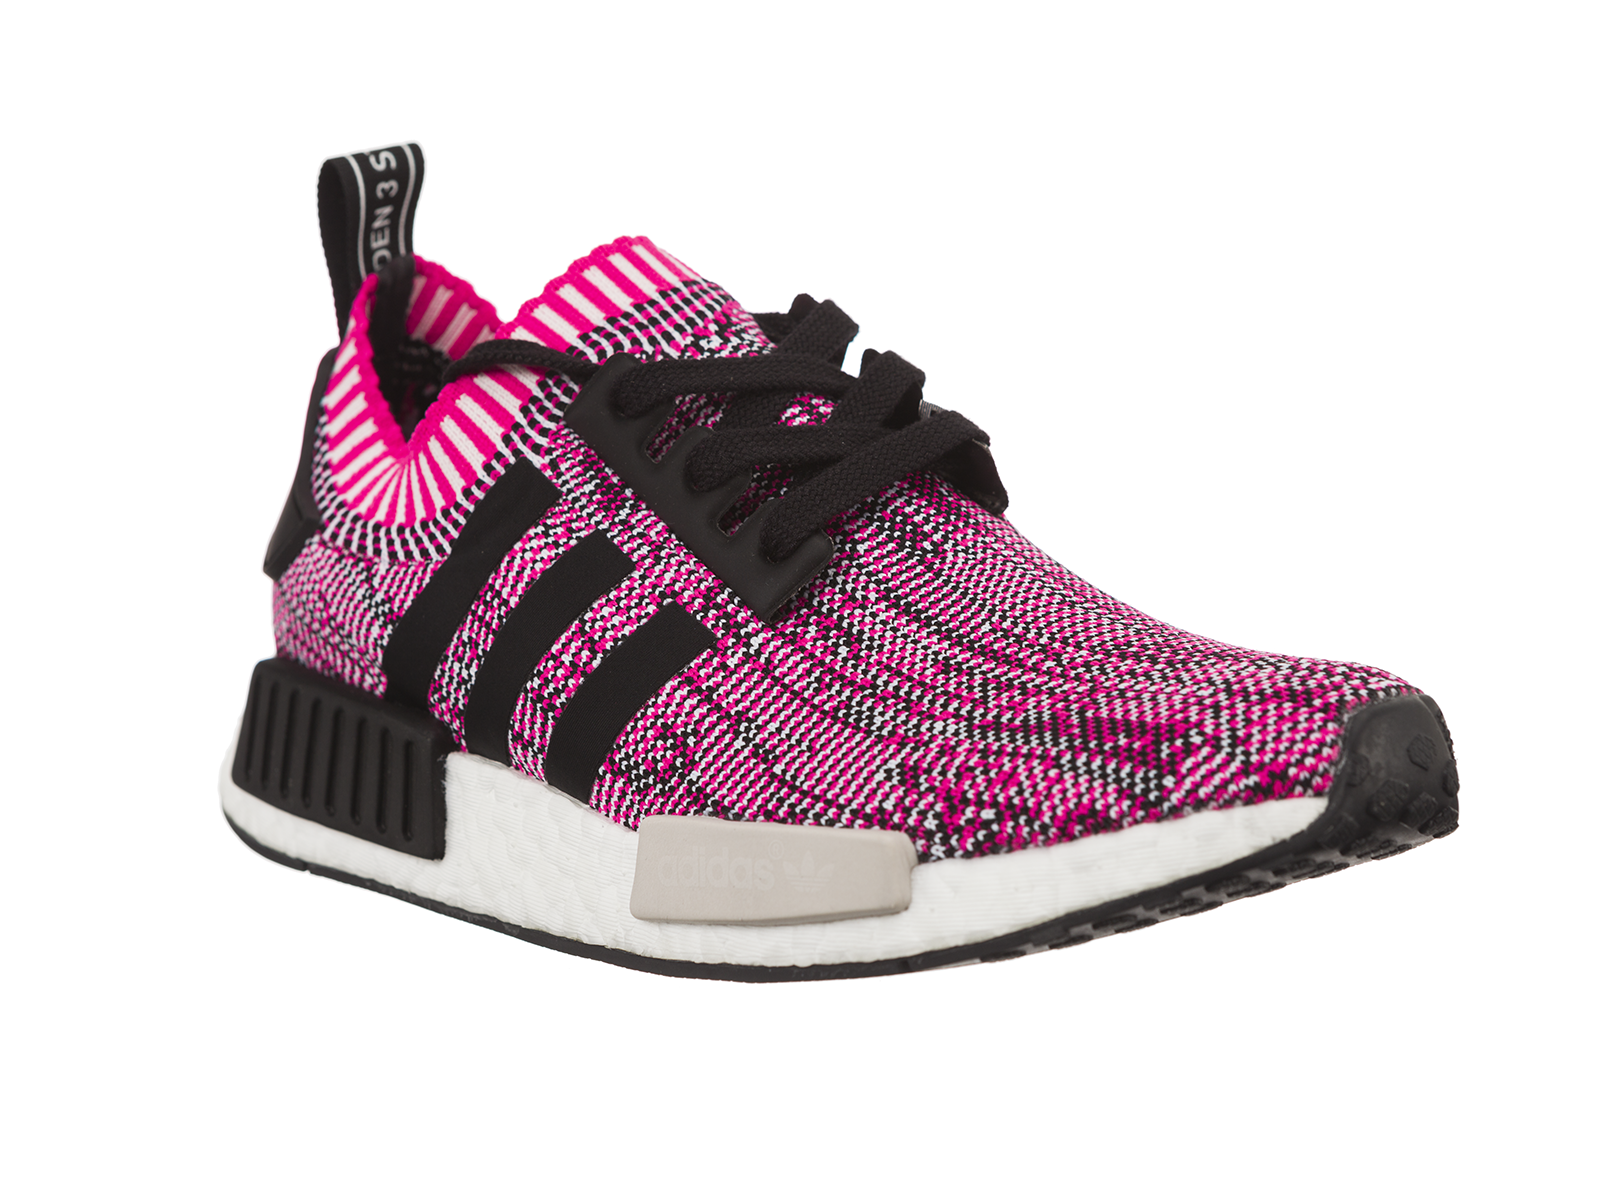 Adidas Originals NMD W PK R1 XR1 CS2 R2 Donna Scarpe Sneaker donna scarpa